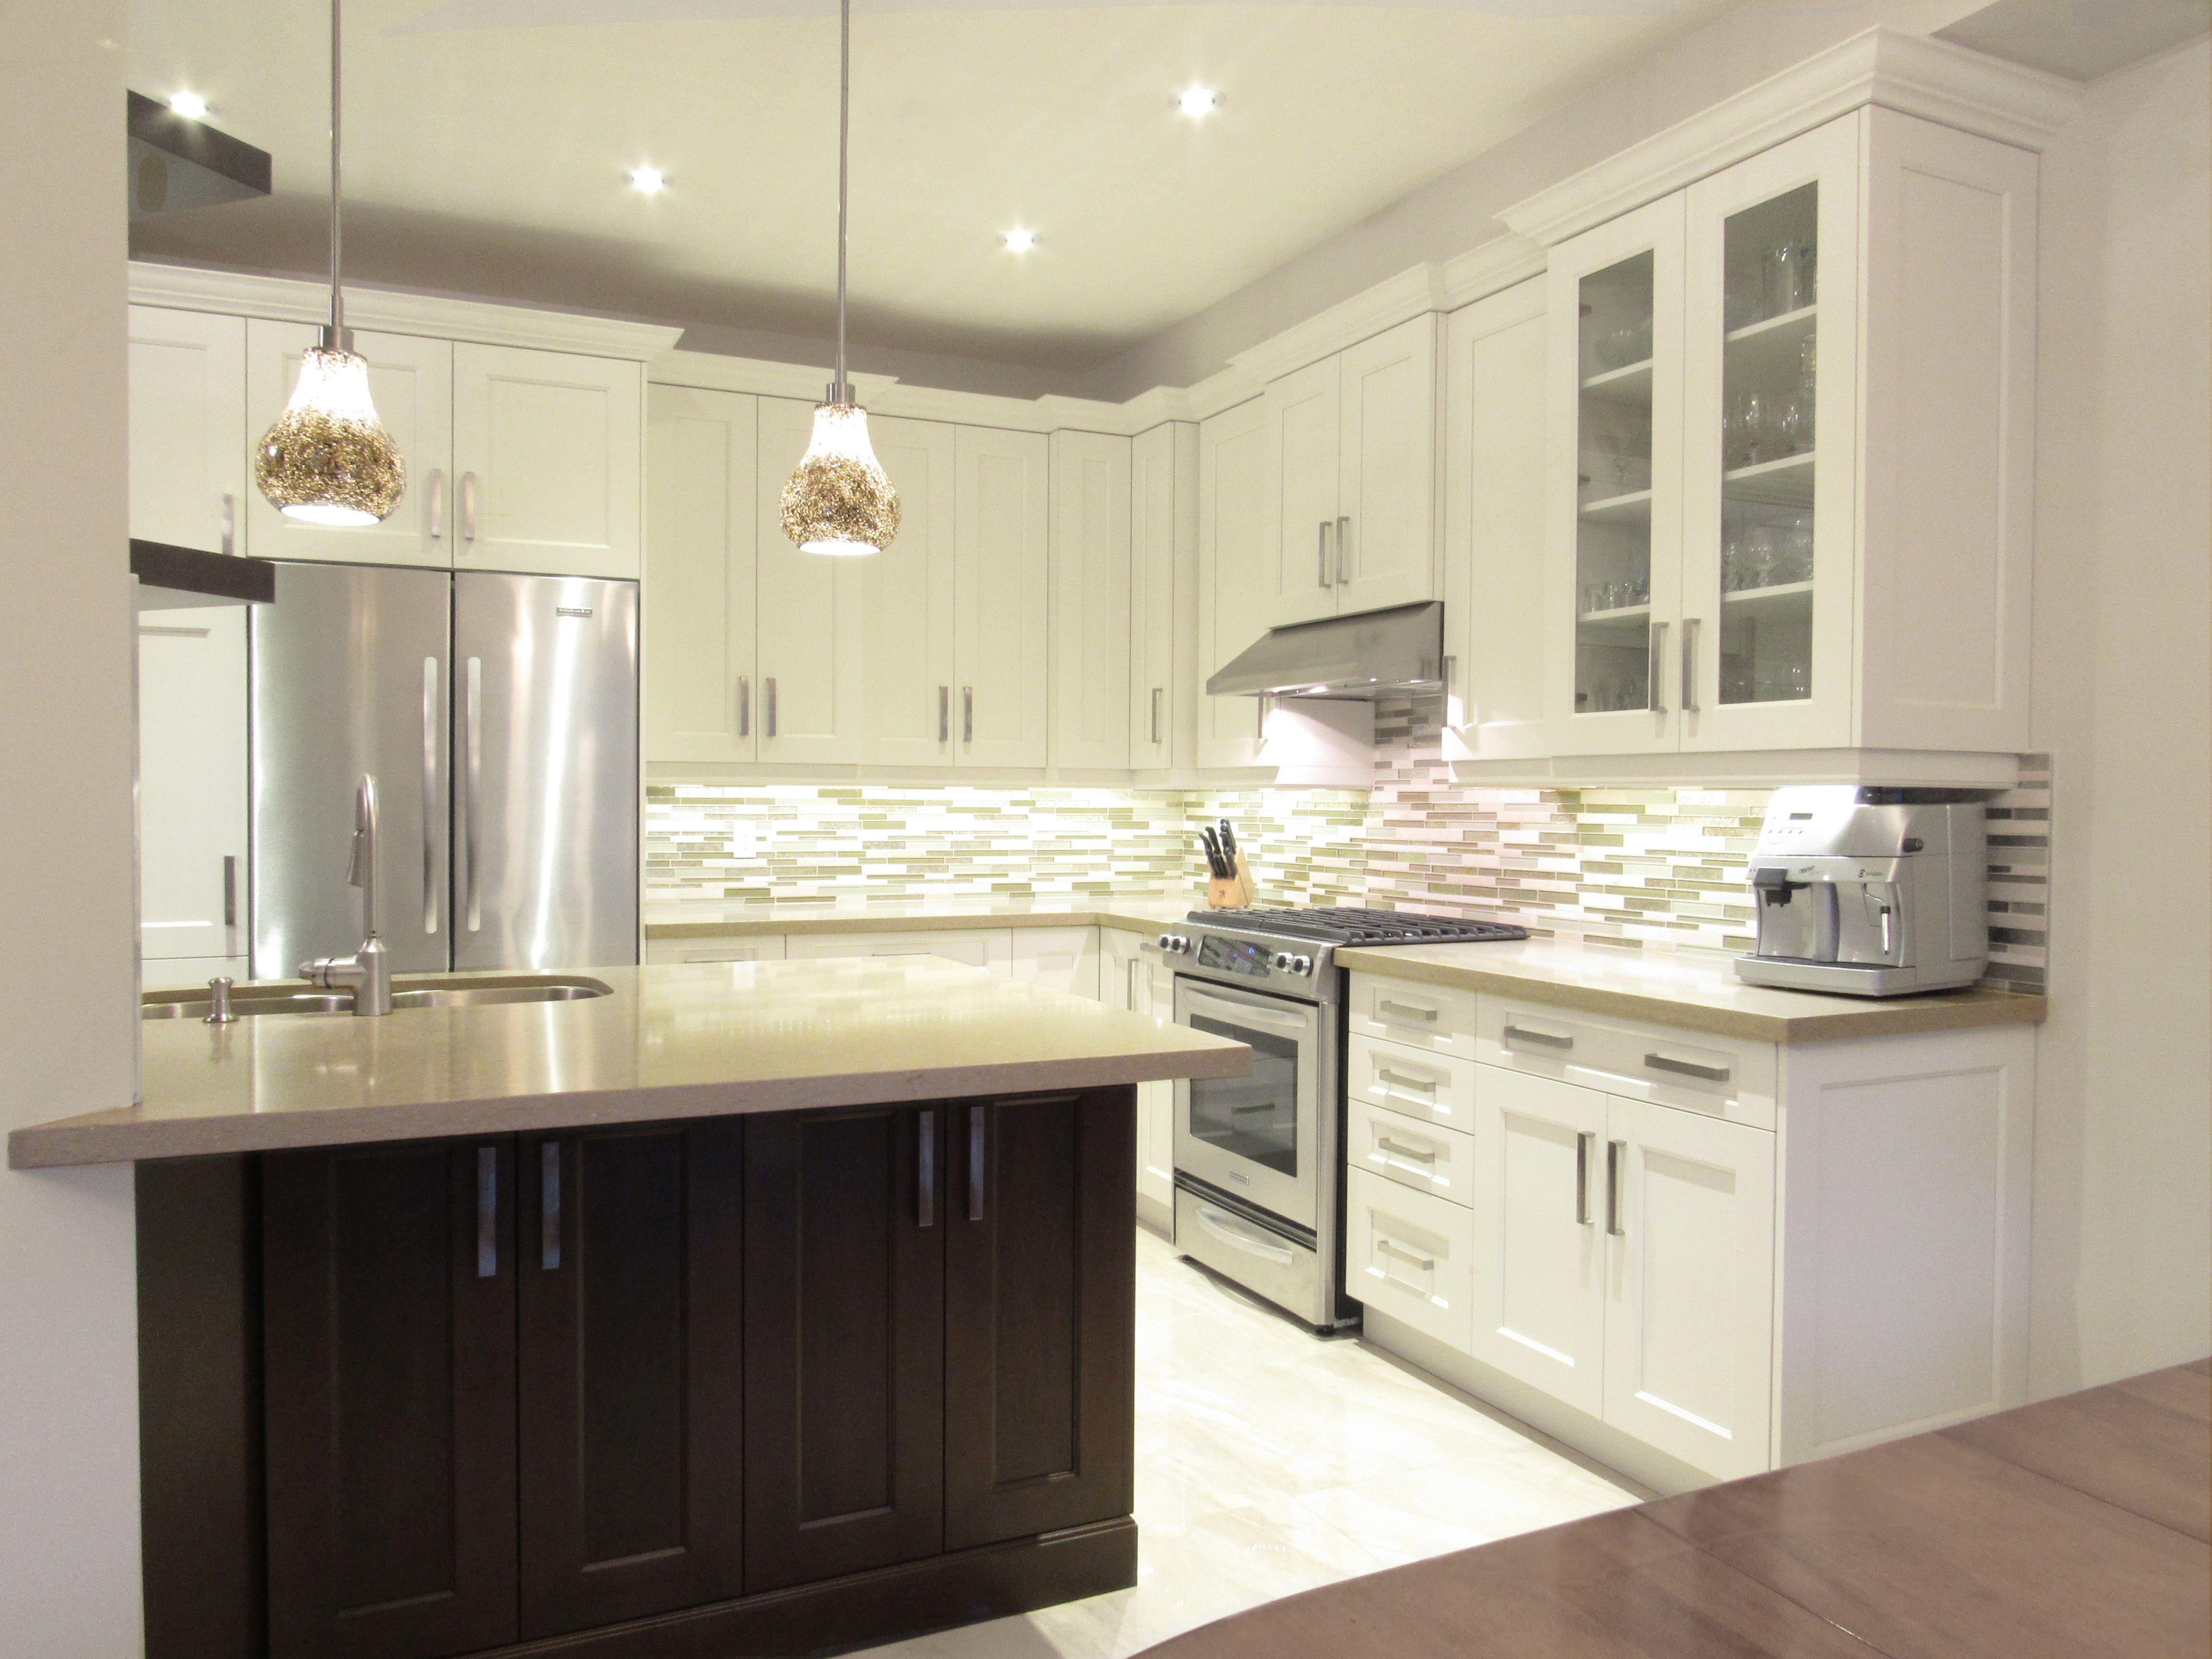 Medium sized, transitional Kitchen, white kitchen, stained